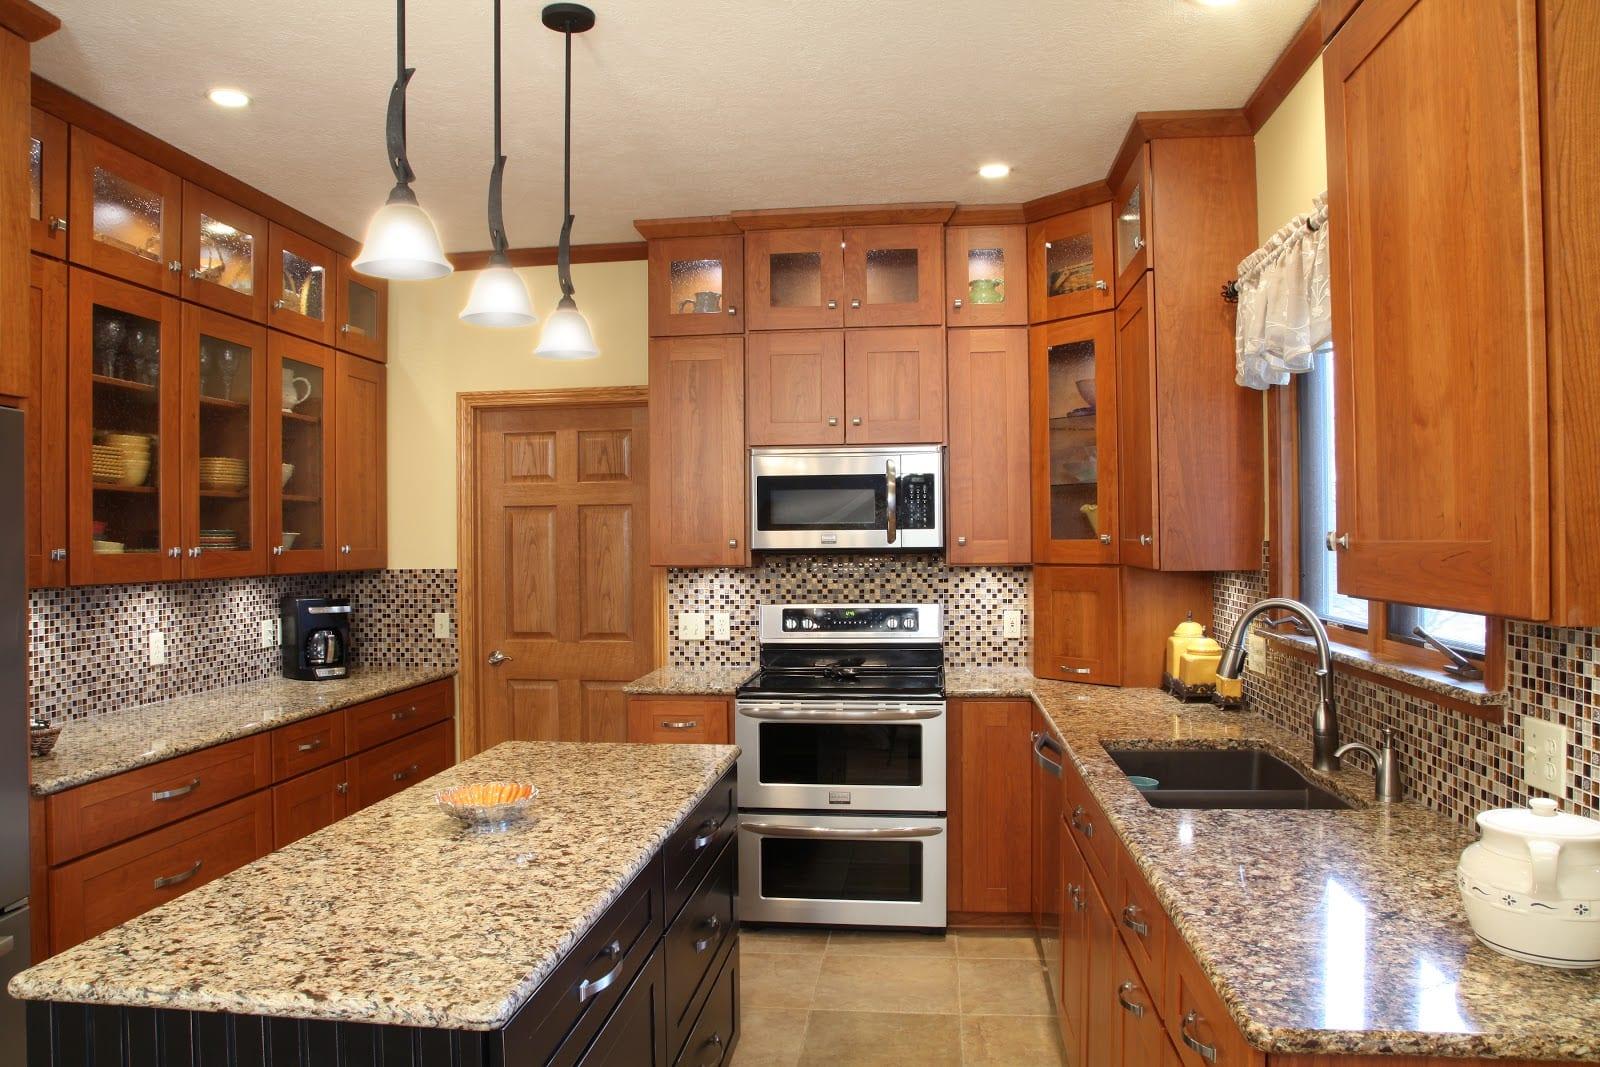 Modernizing your kitchen